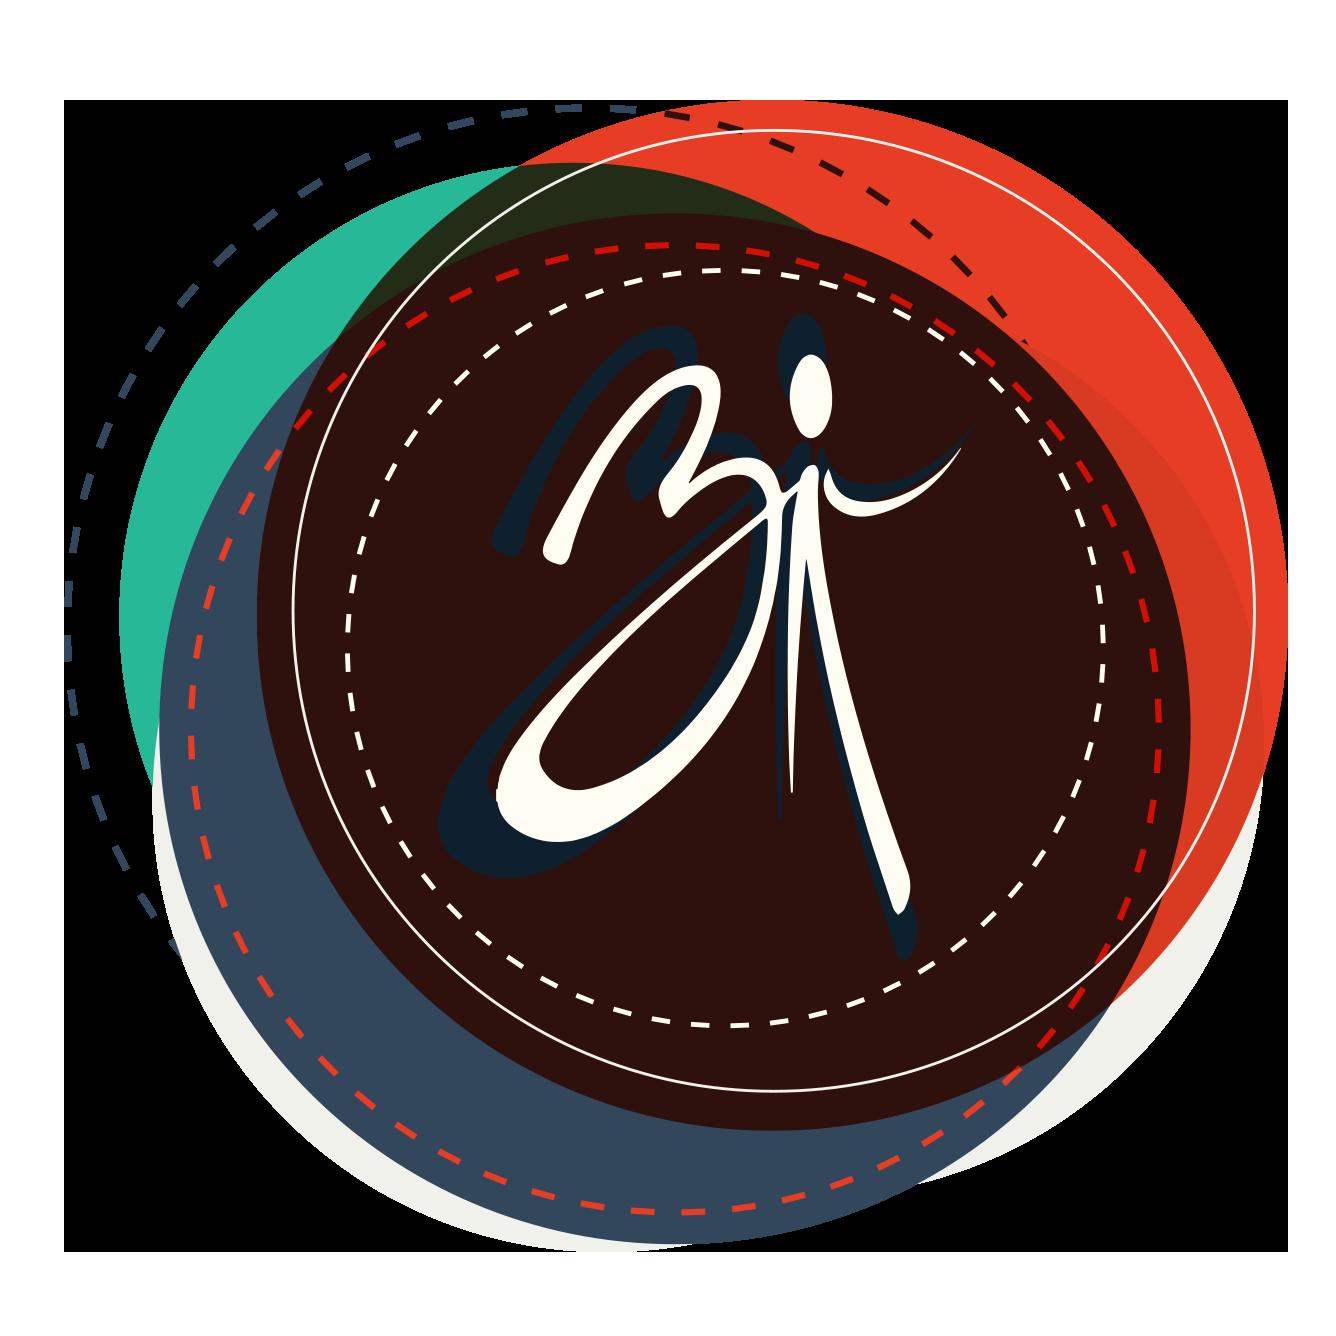 fileaarohan logopng wikimedia commons